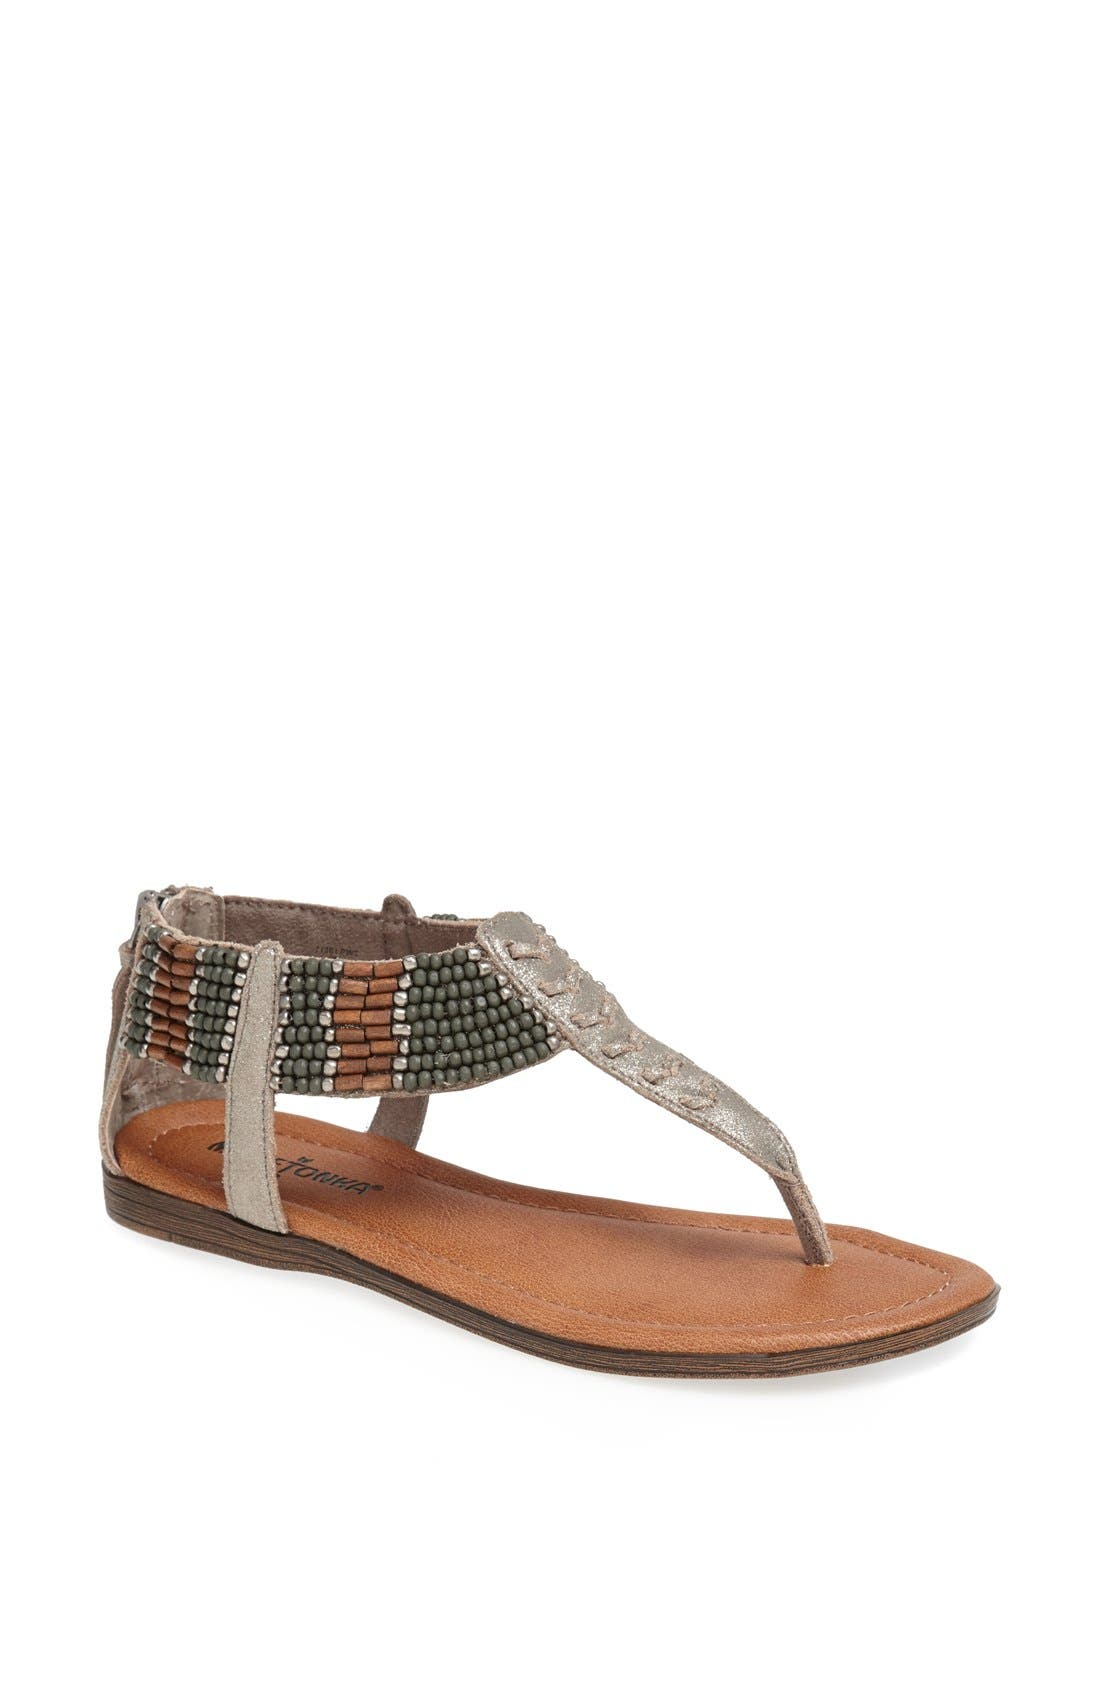 Main Image - Minnetonka 'Ibiza' Sandal